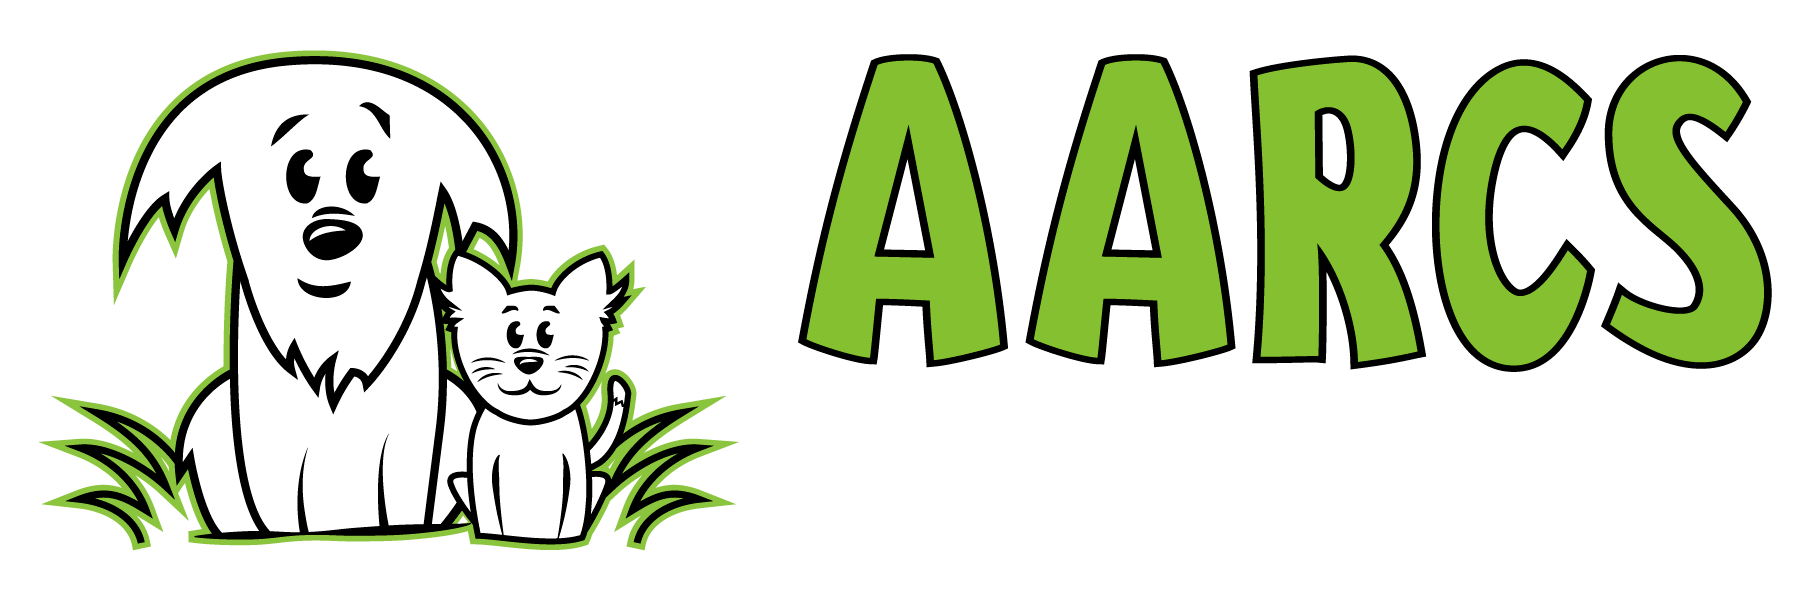 aarcs-logo2015-light.png